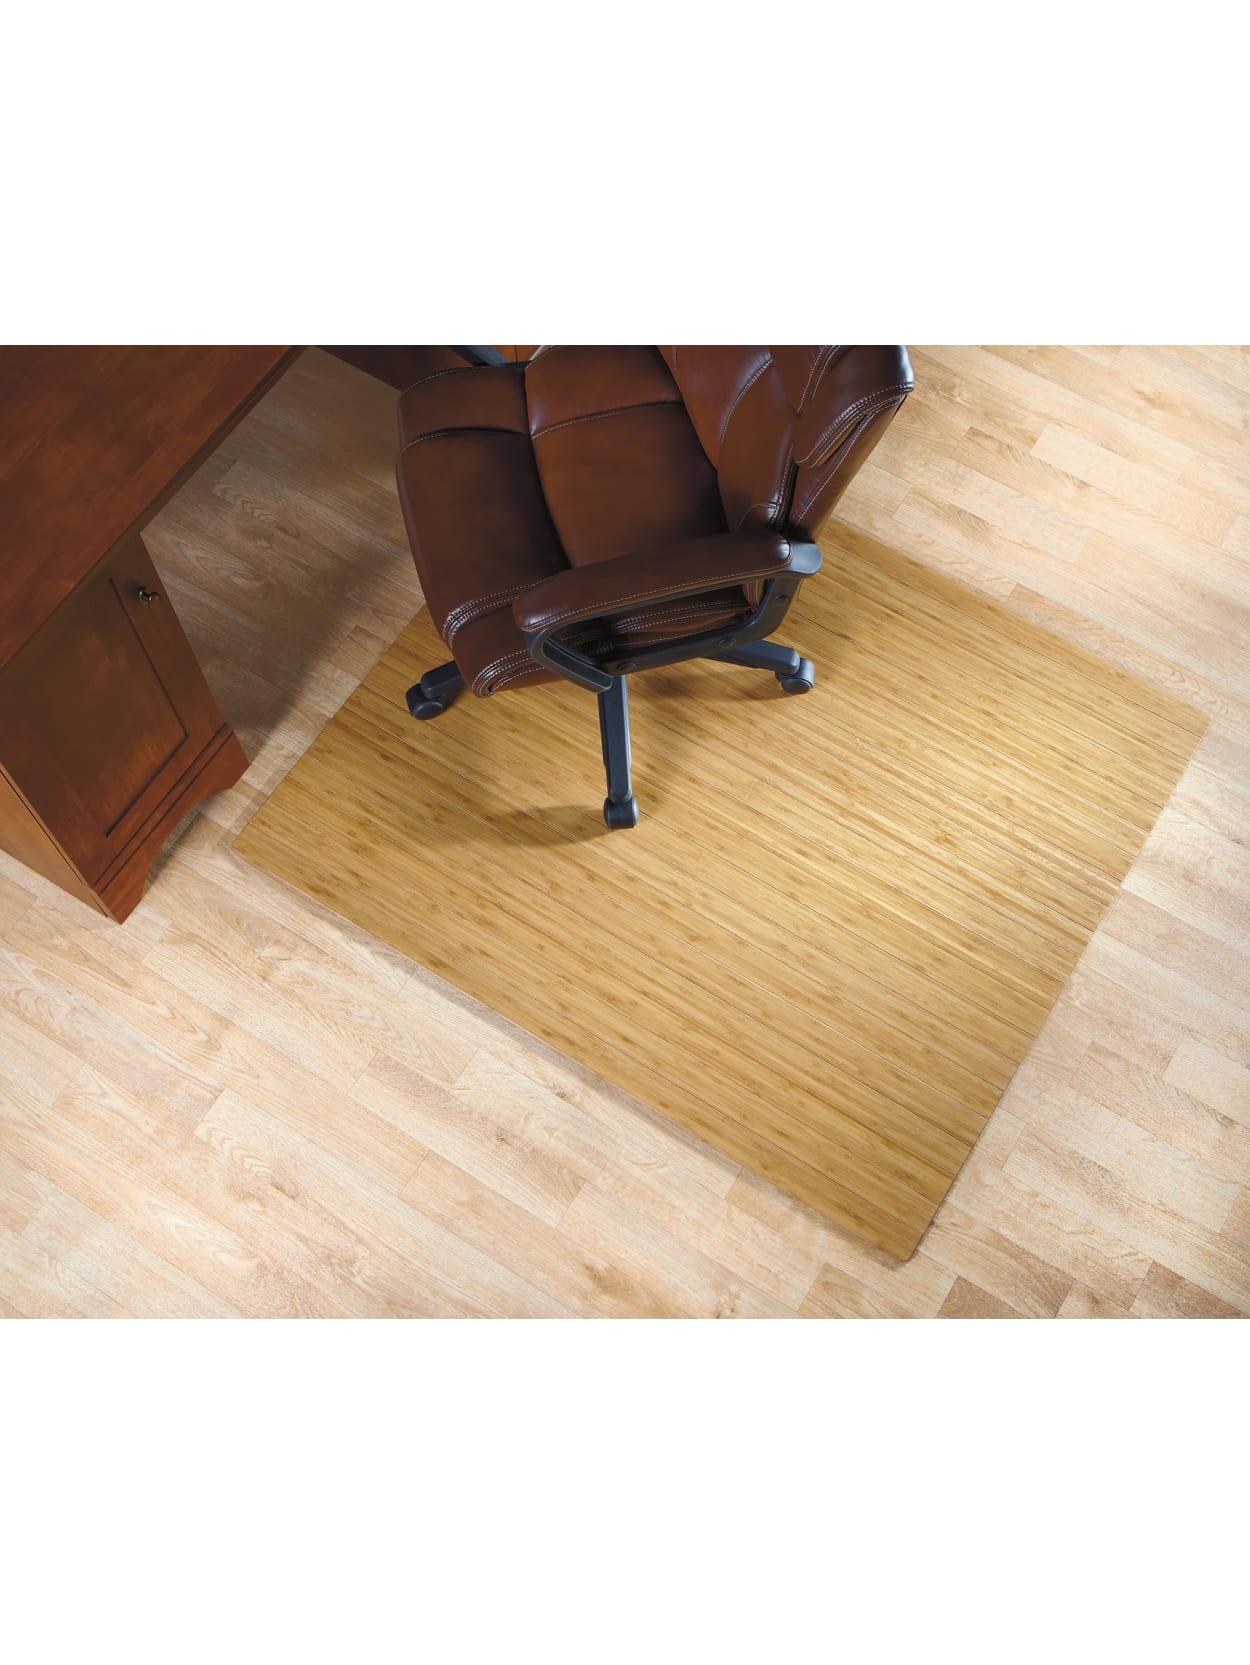 Realspace Bamboo Roll Up Chair Mat 48 X 52 Natural Office Depot